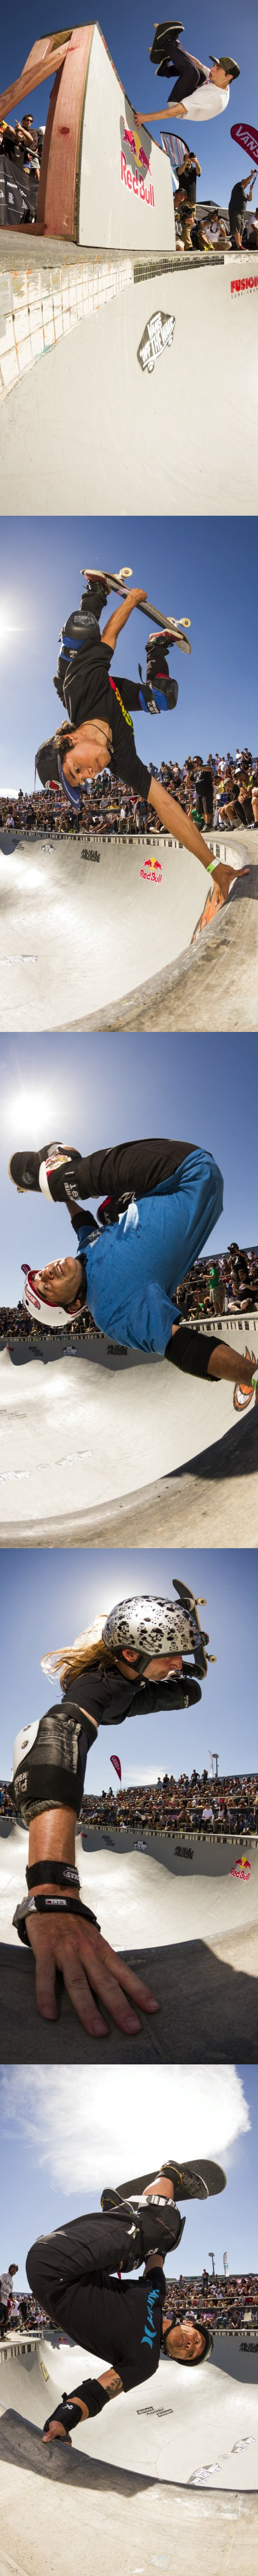 Inverted #skateboard #redbull #skateboard #bowlarama #vans © David Read / Red Bull Content Pool